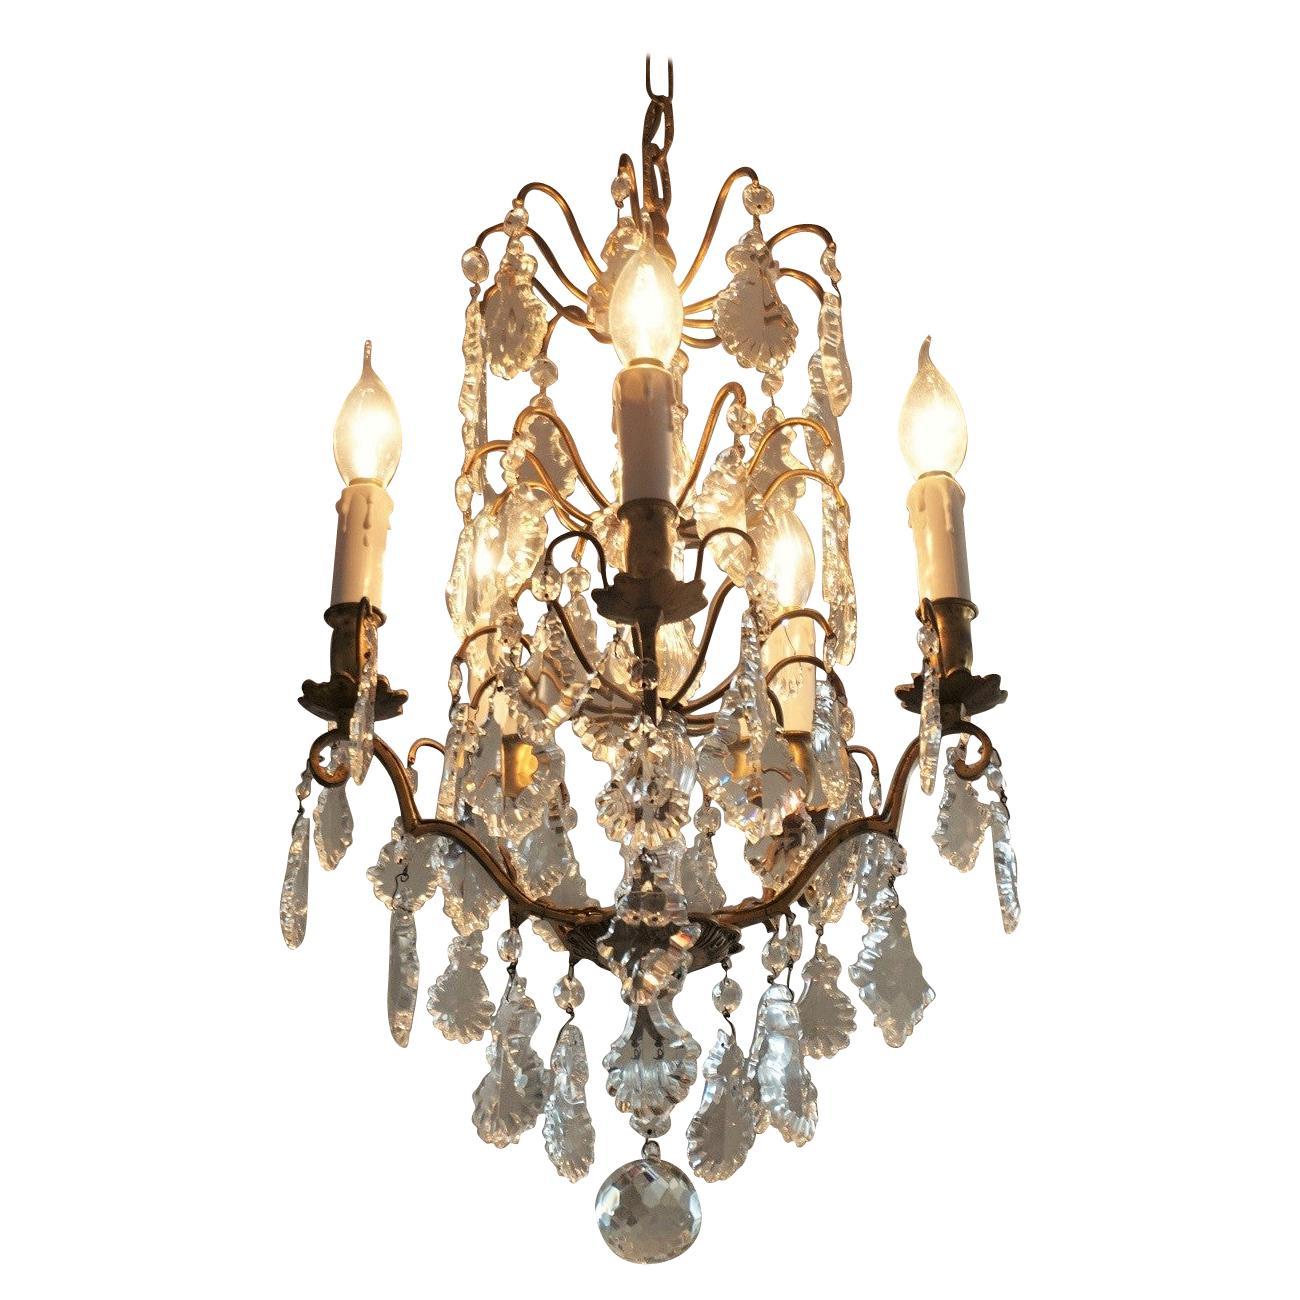 19th Century Baccarat Crystal Chandelier Five-Light Chandelier